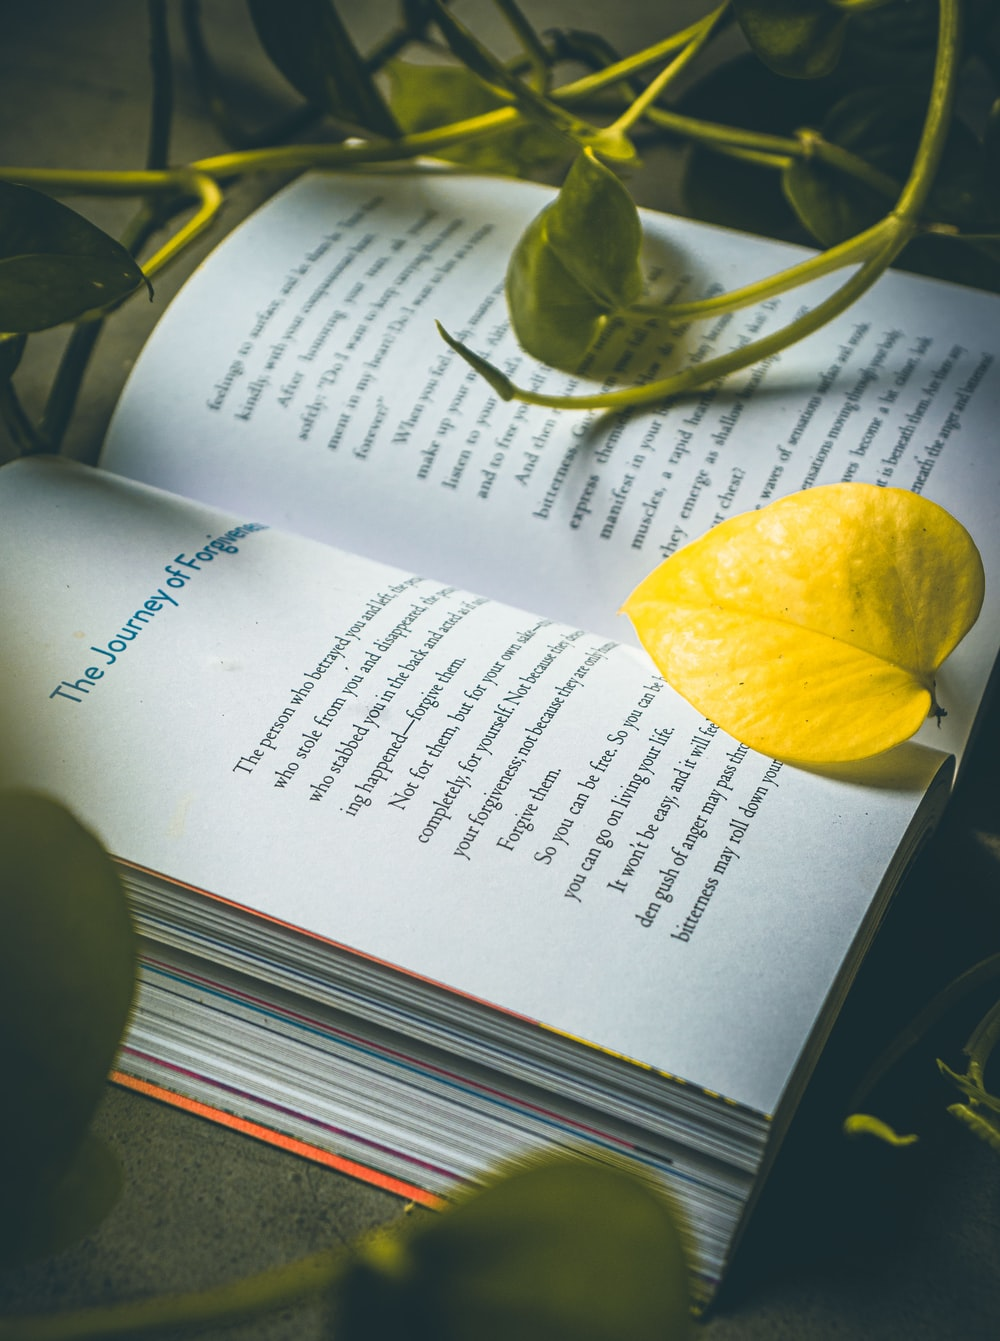 yellow lemon on white book page